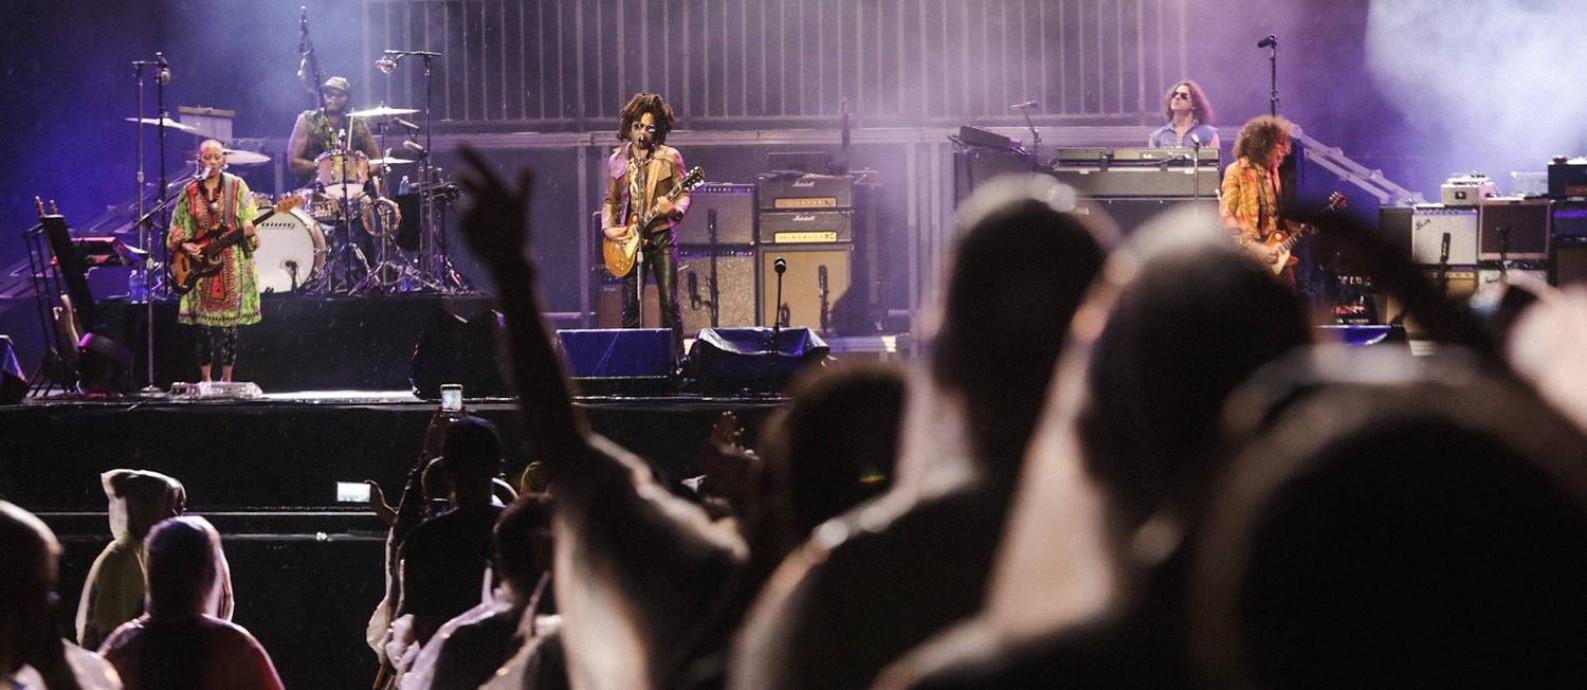 Lenny Kravitz levou os seus maiores hits para o palco Foto: Rodrigo Gianesi